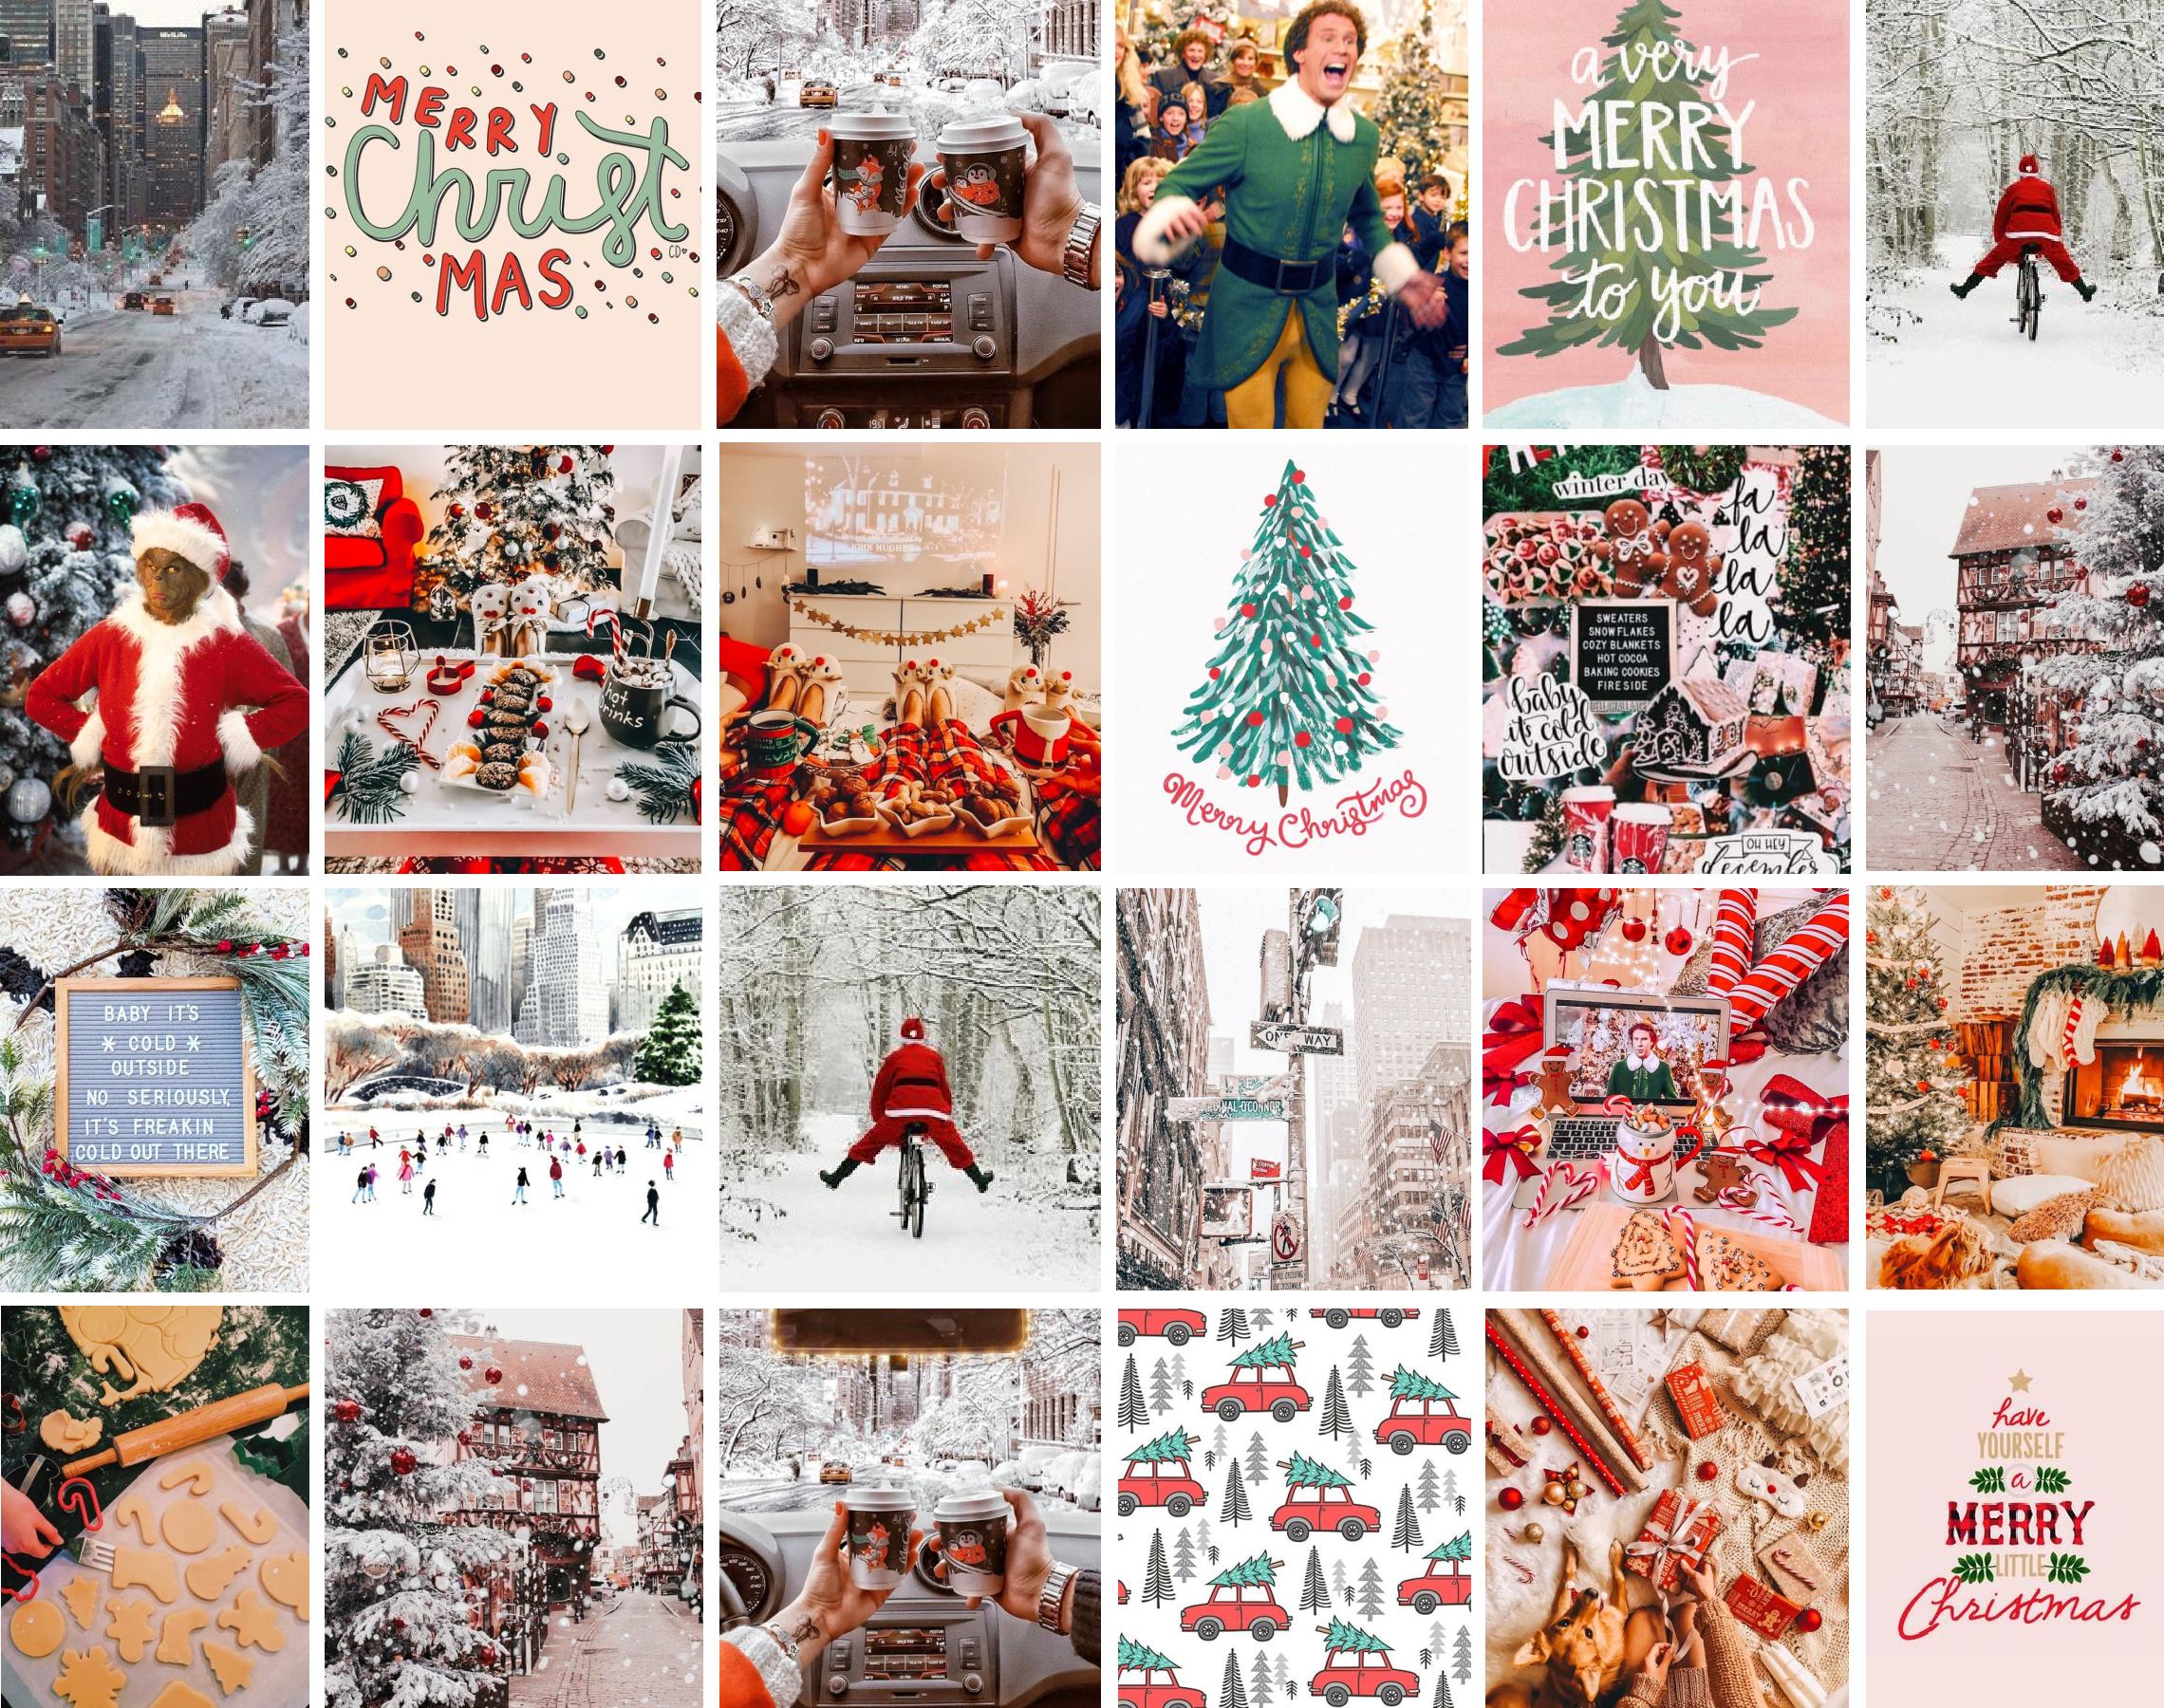 Christmas Wallpaper Christmas Wallpaper Cute Christmas Wallpaper Christmas Room